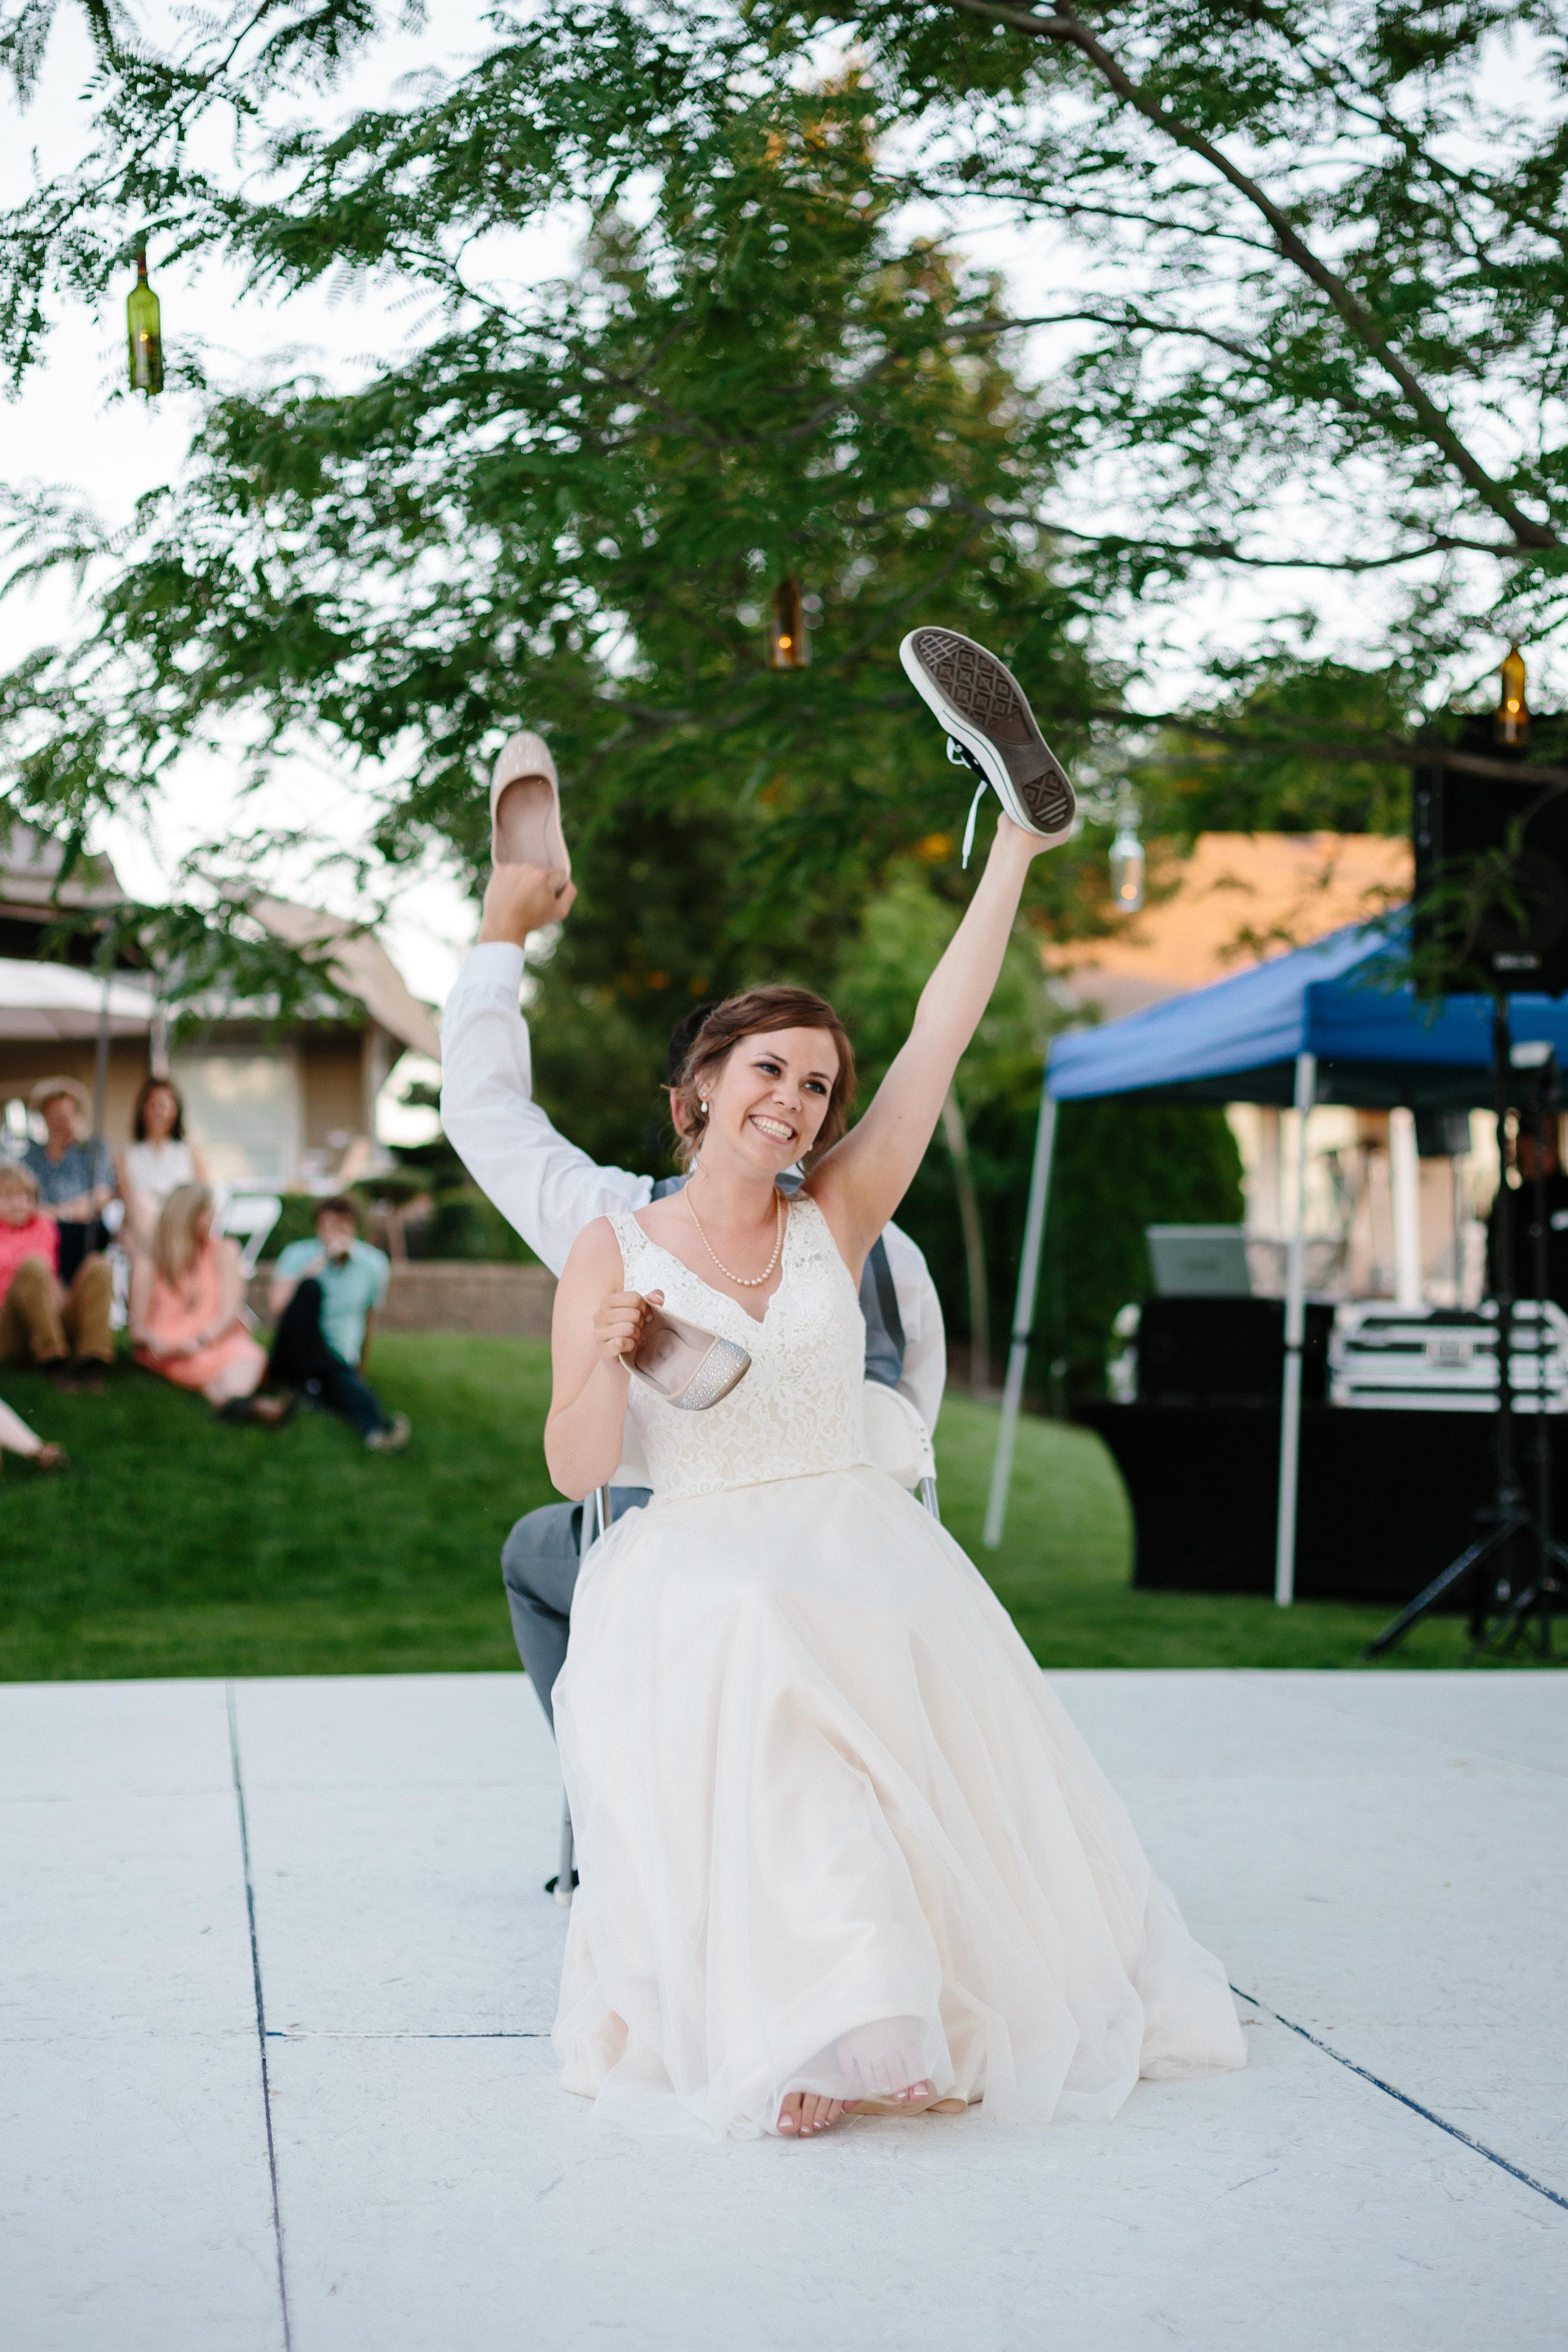 Jordan & Shantel Married - Idaho - Corrie Mick Photography-338.jpg